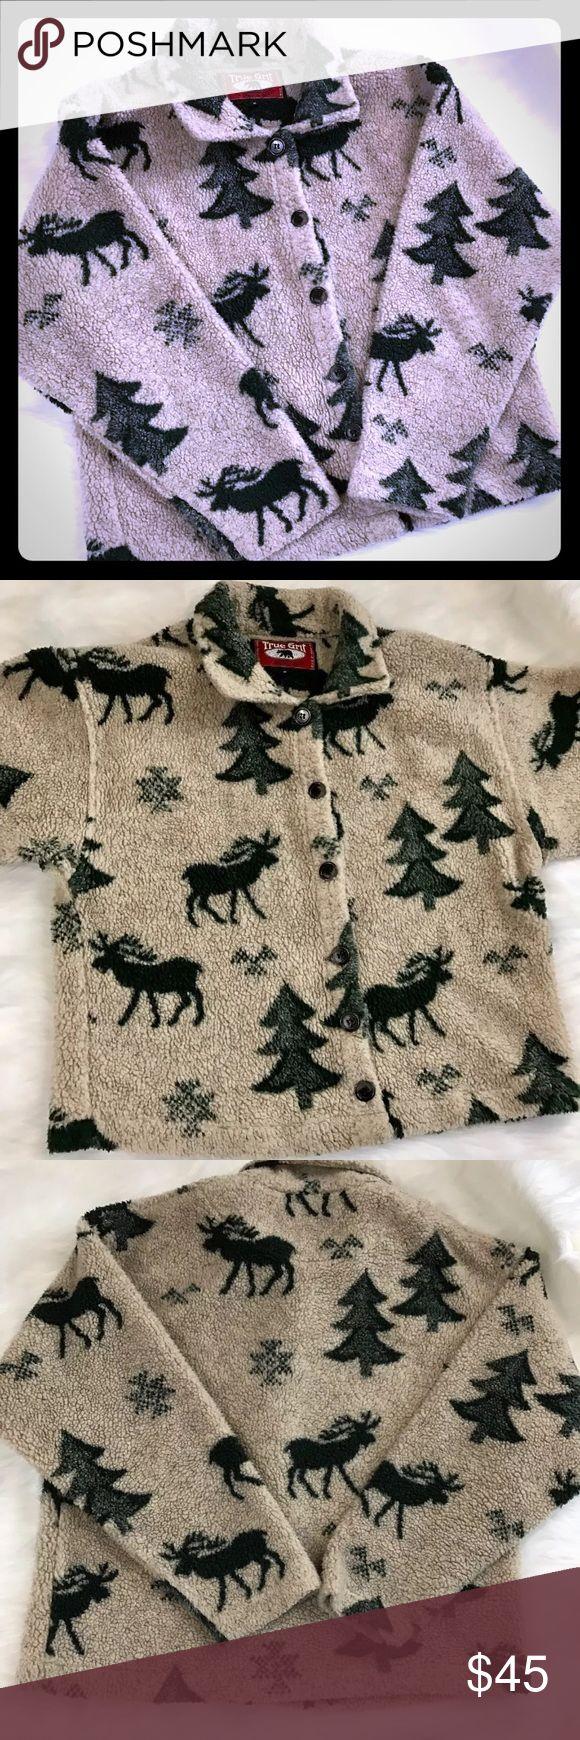 Vintage True Grit Fleece Jacket Awesome Vintage Authentic Fleece True Grit Jacket. Deer in Trees. See photos for full details. True Grit Jackets & Coats